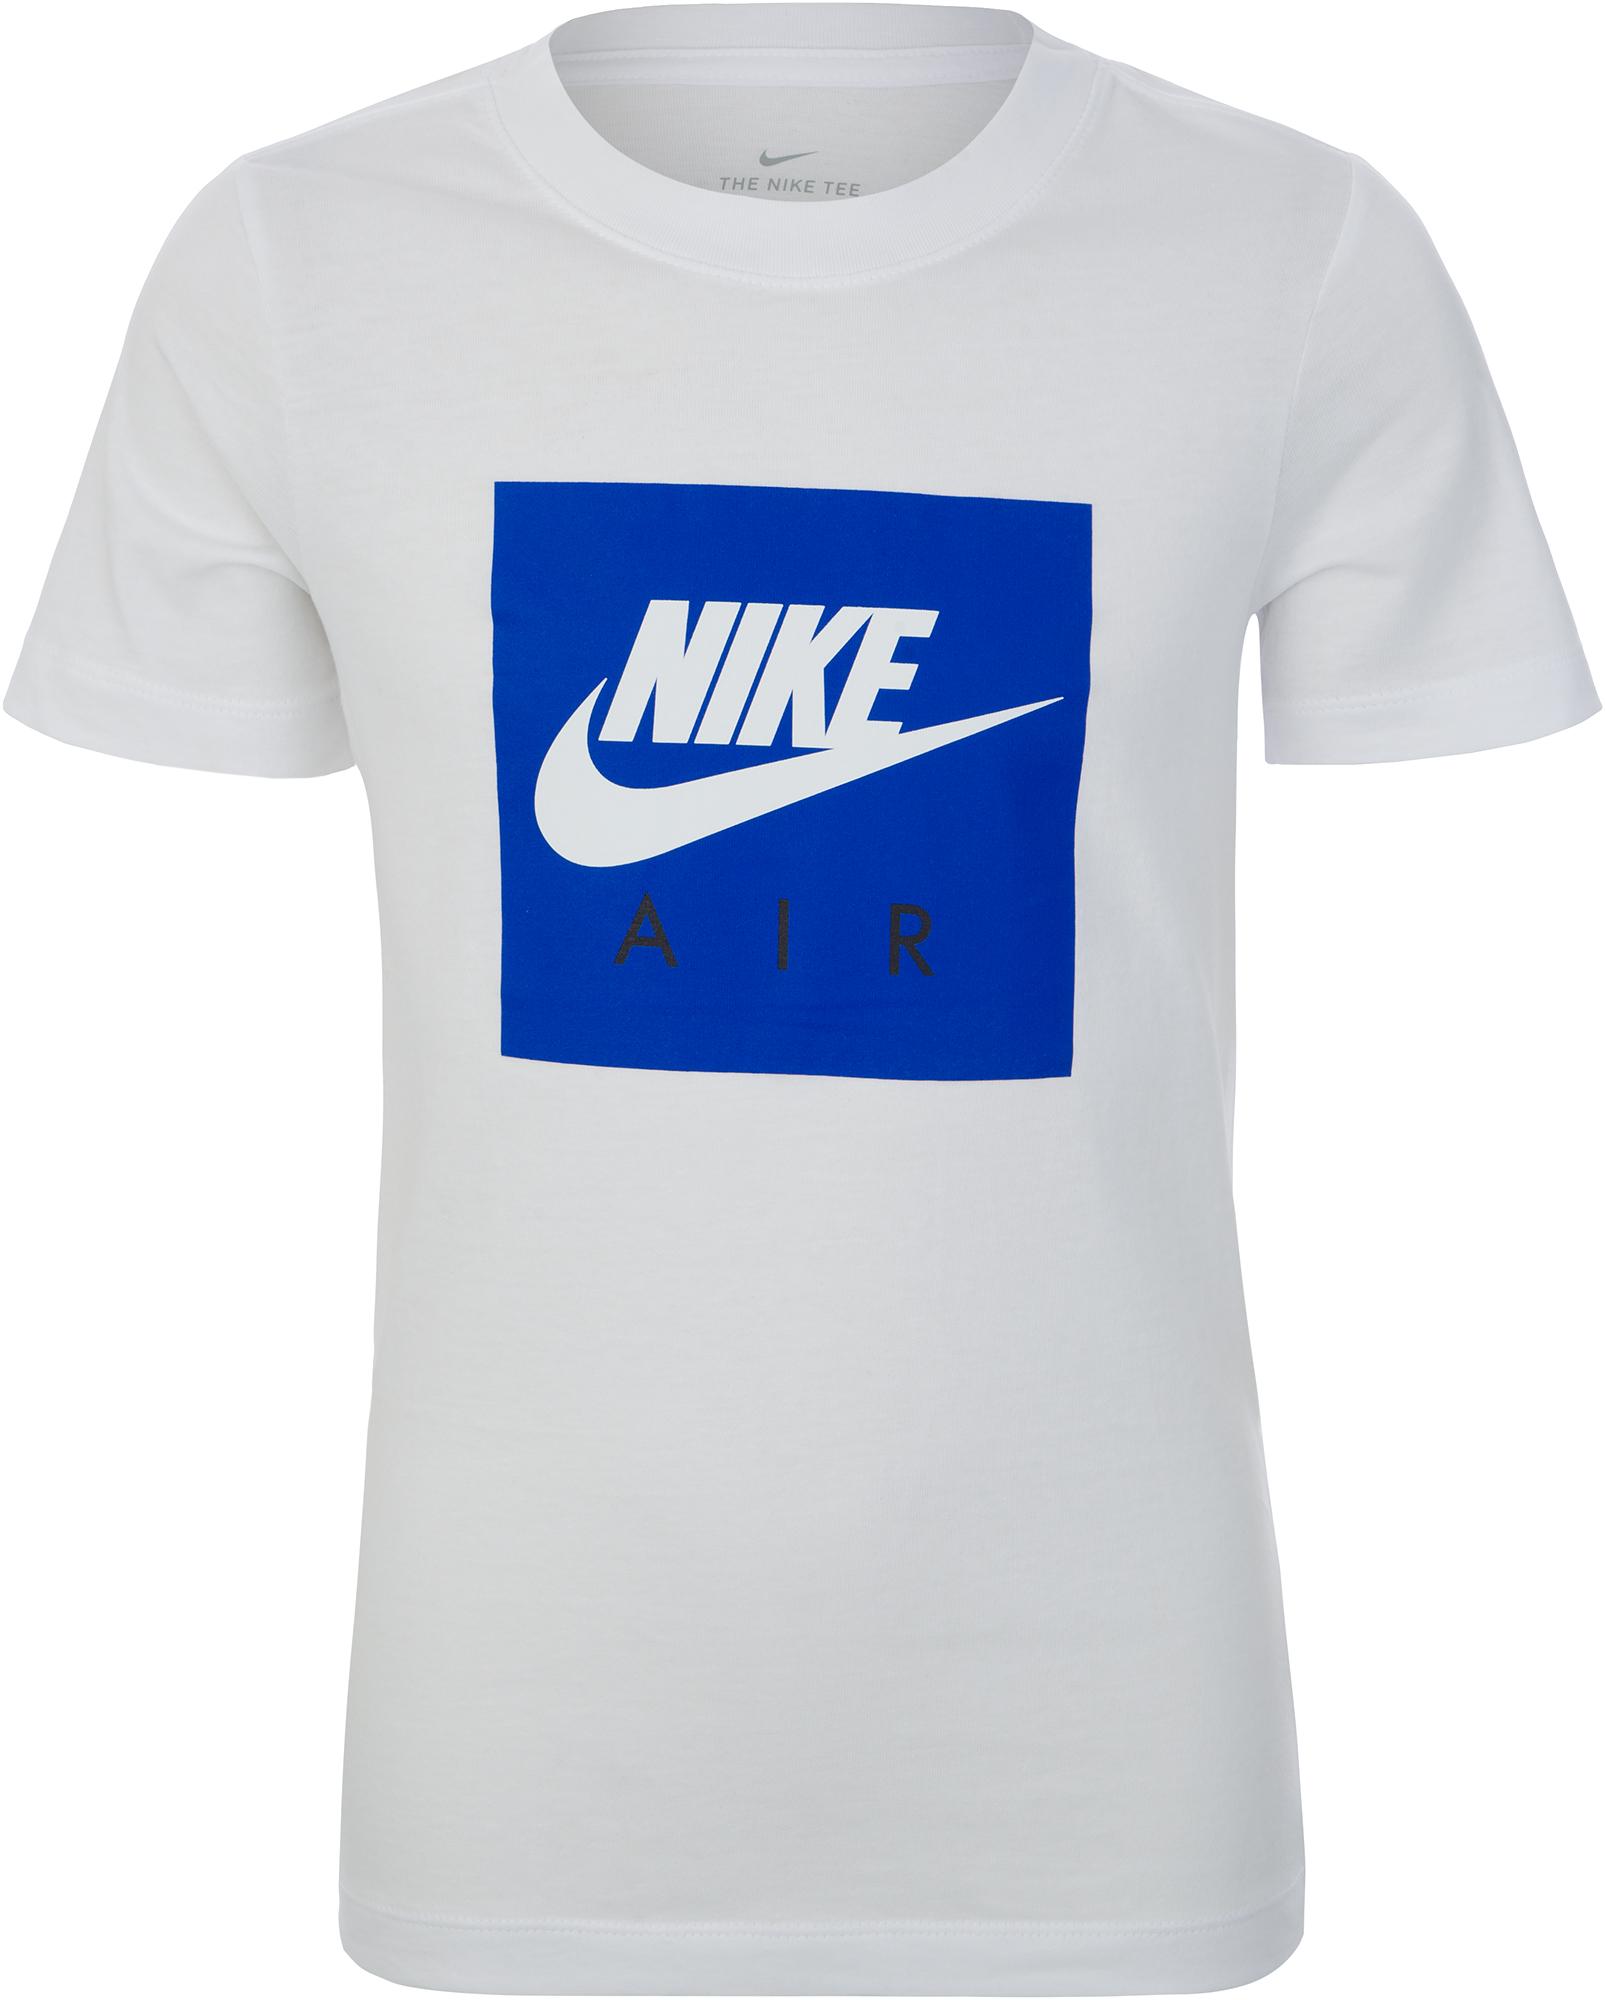 Nike Футболка для мальчиков Nike Sportswear, размер 158-170